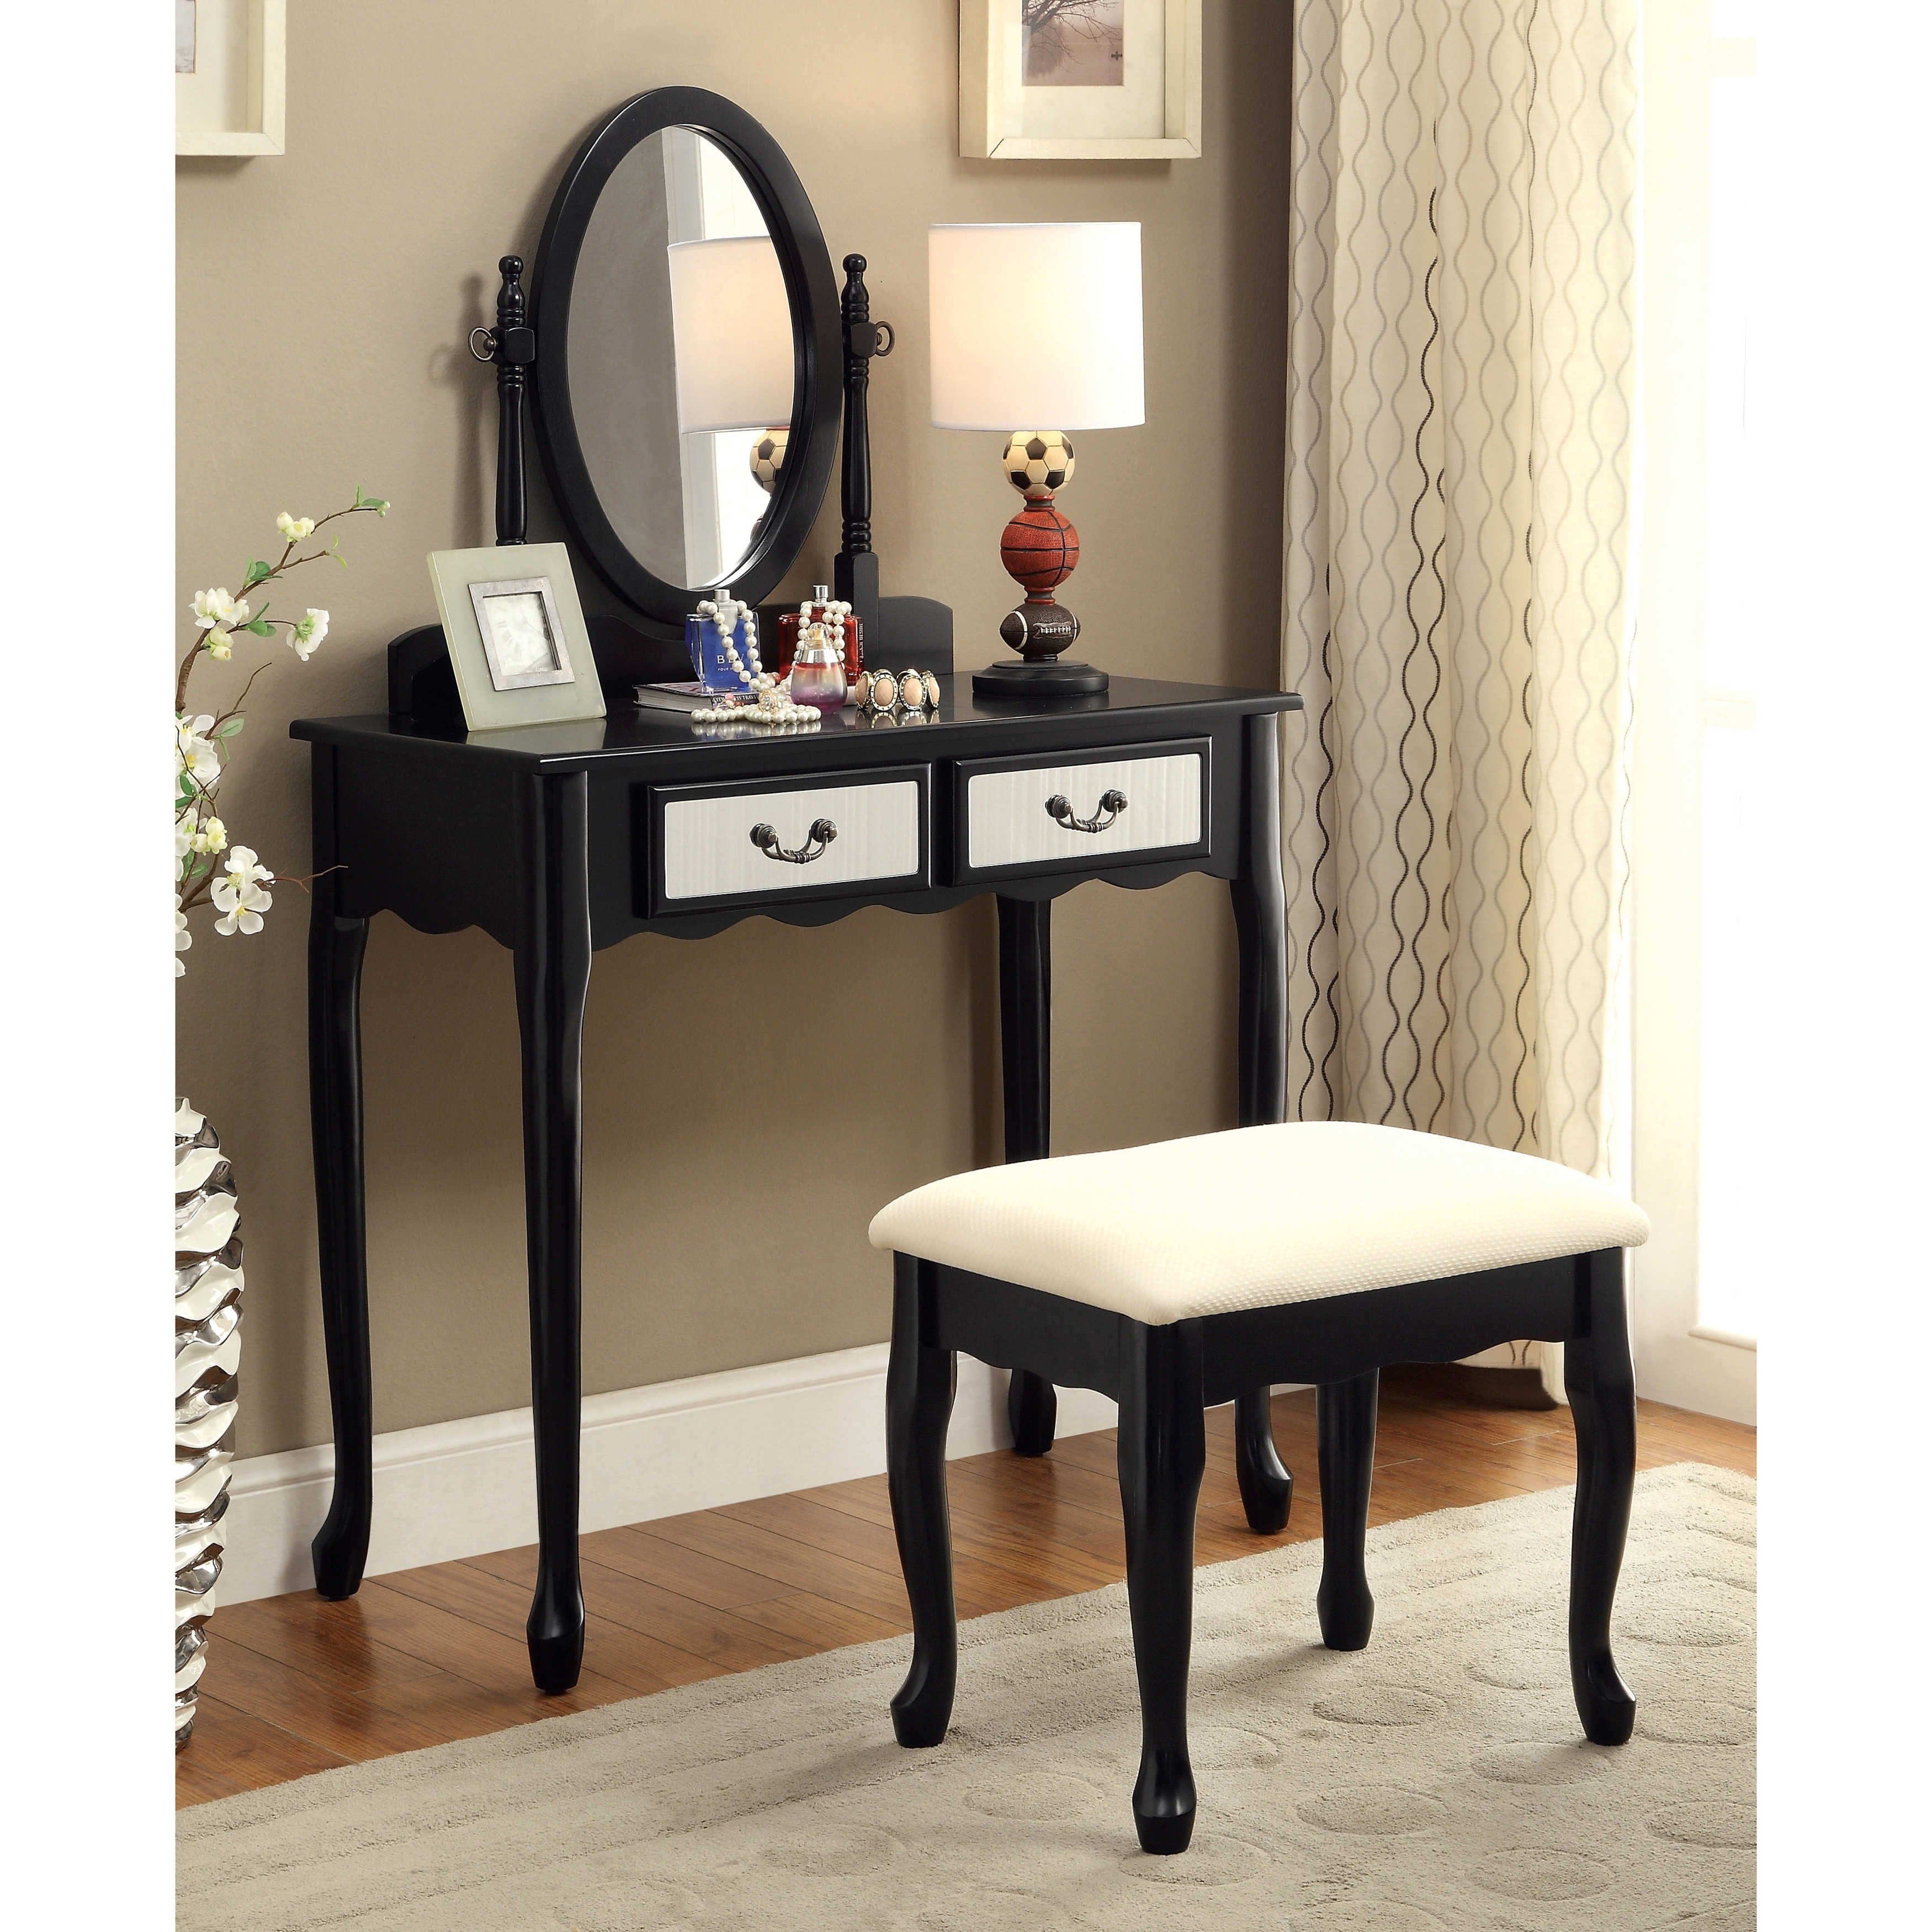 Furniture Of America Savanna 2 Piece Classic Vanity Table And Stool ...